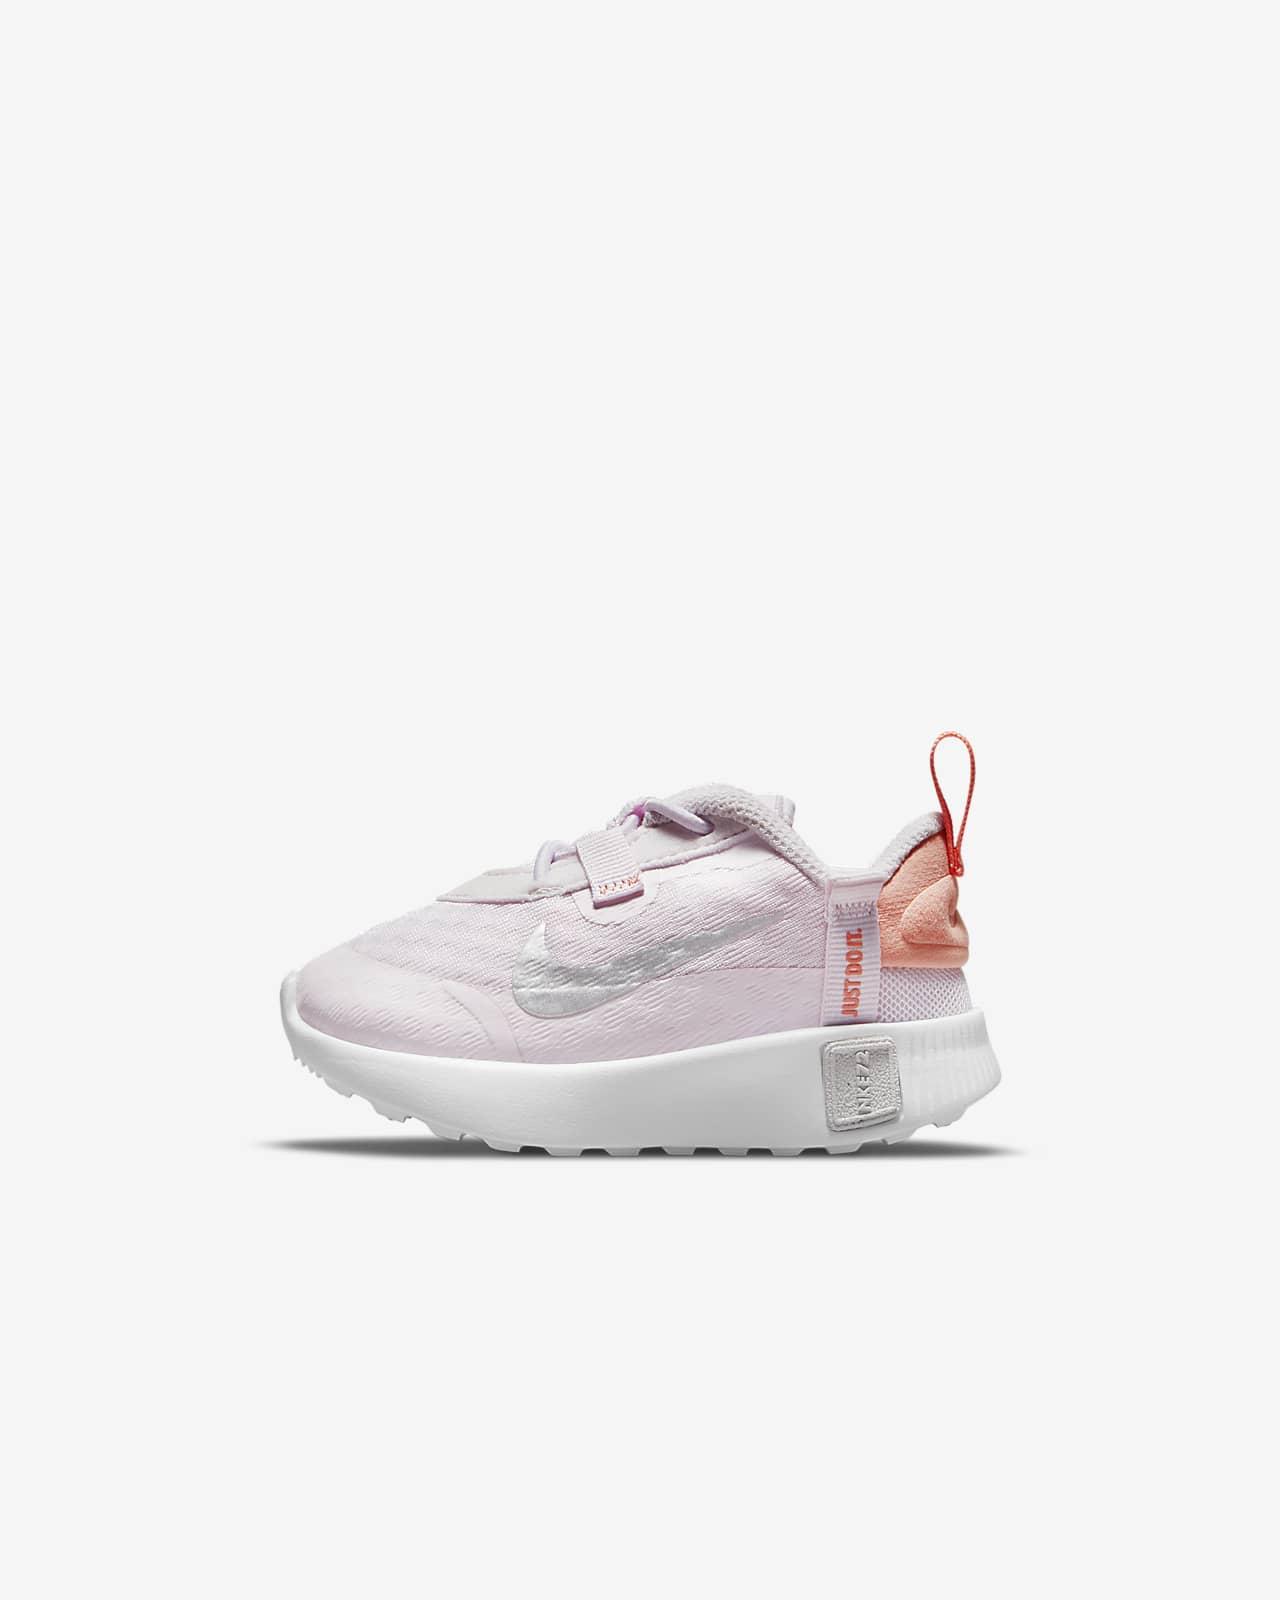 Nike Reposto Baby and Toddler Shoe